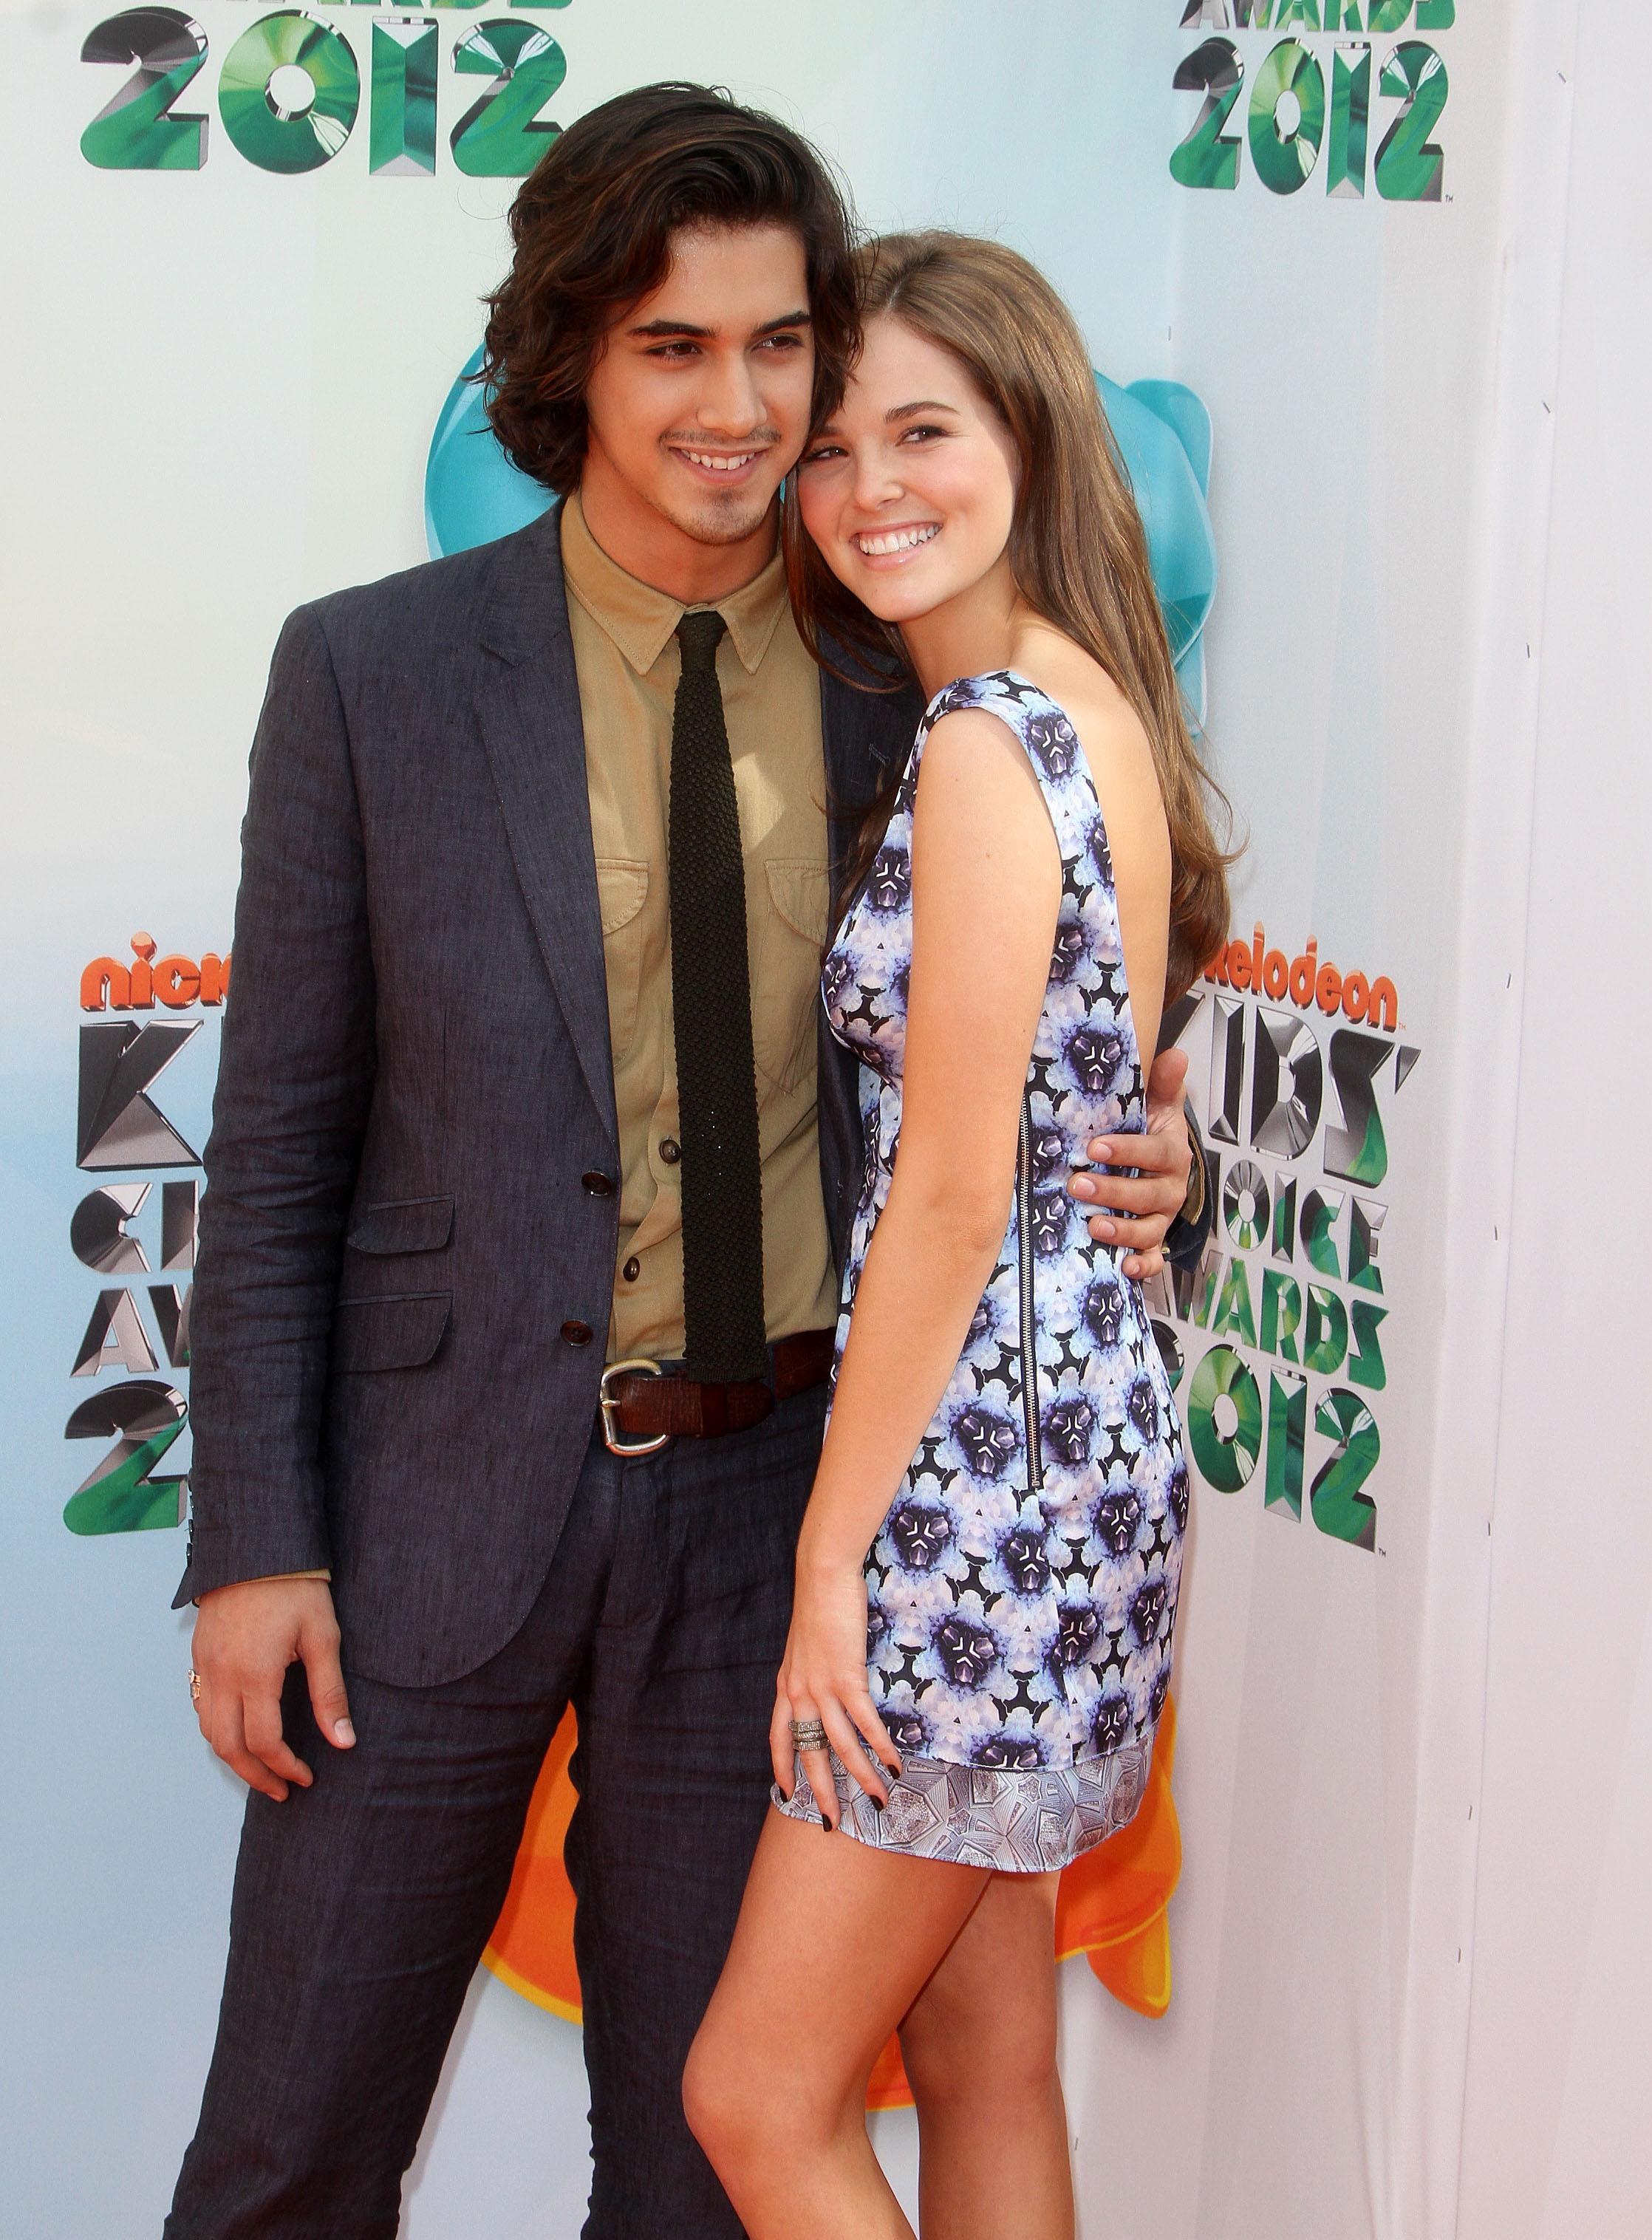 335854594_CFF_Zoey_Deutch_Nickelodeons_25th_Annual_Kids_Choice_Awards_In_LA_March_31_2012_021_122_505lo.jpg